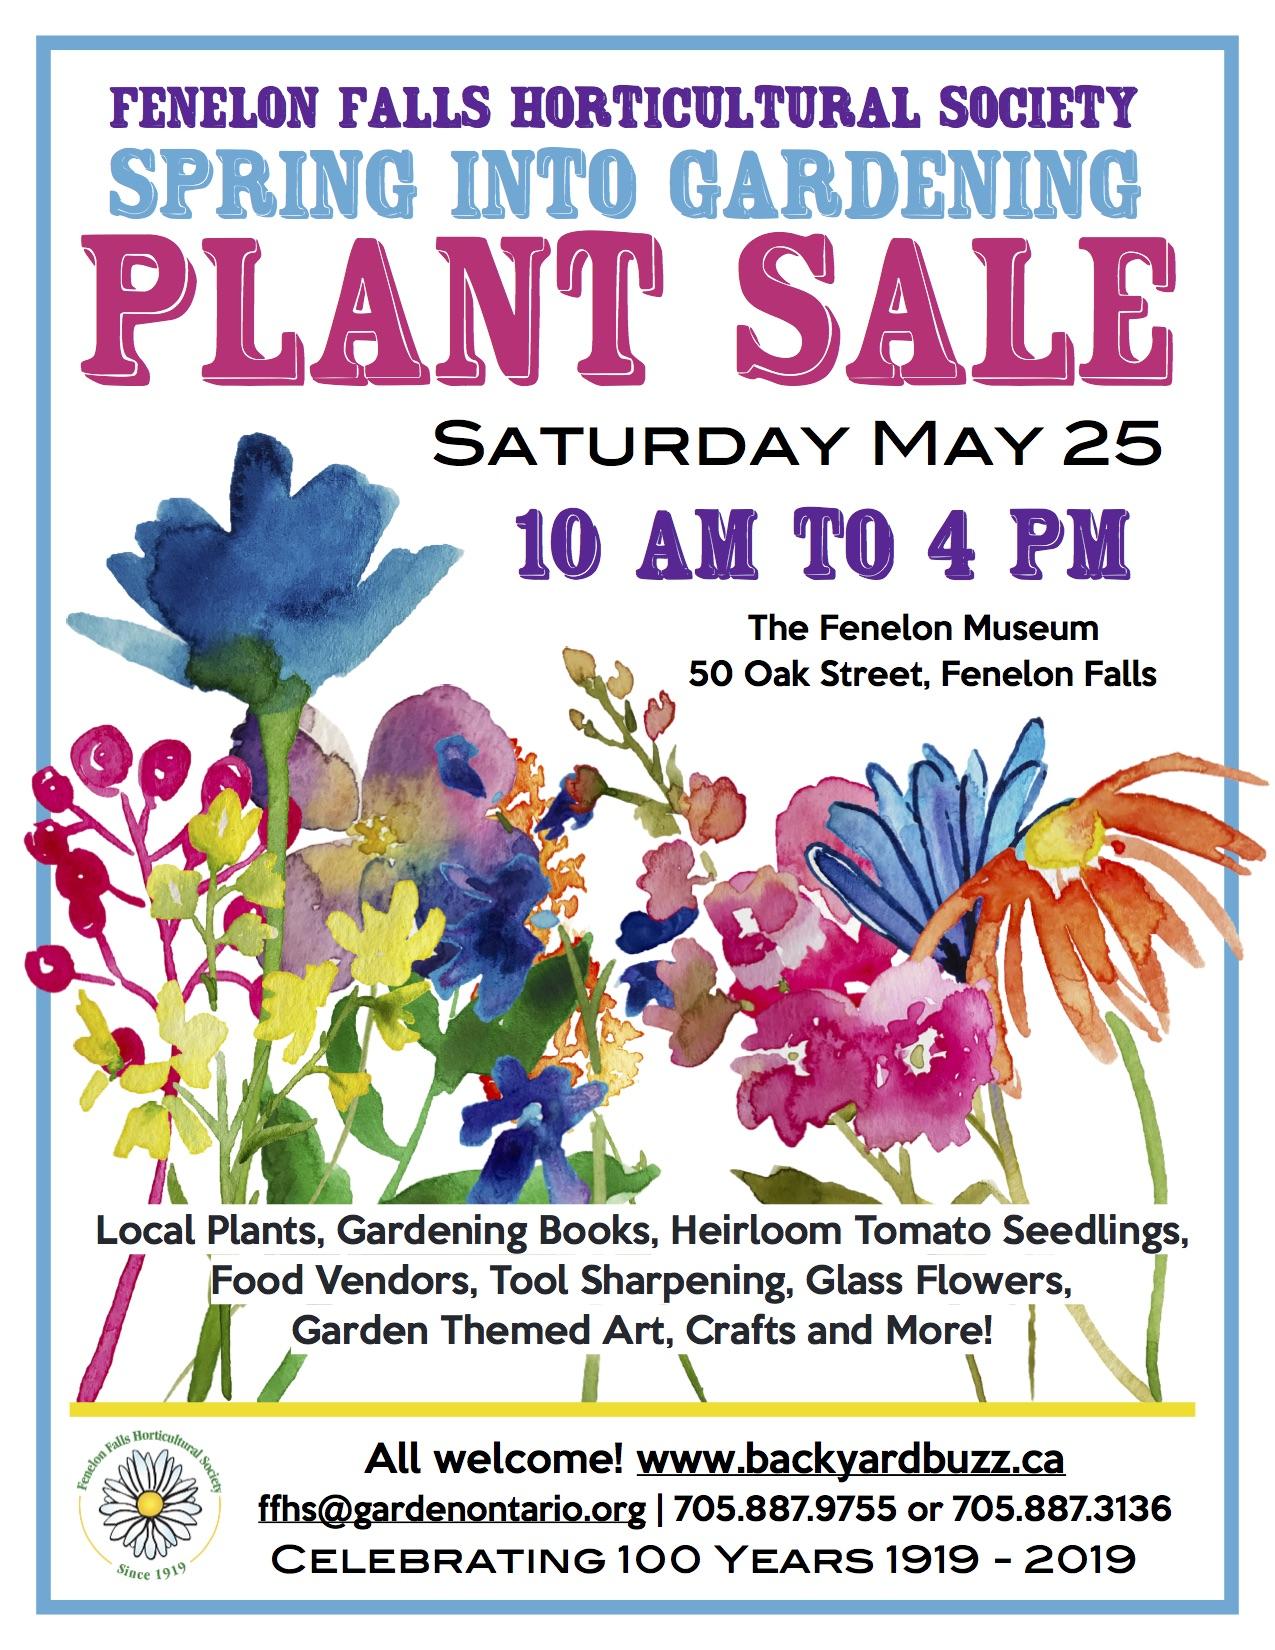 FFHS Poster Plant Sale 2019.jpg